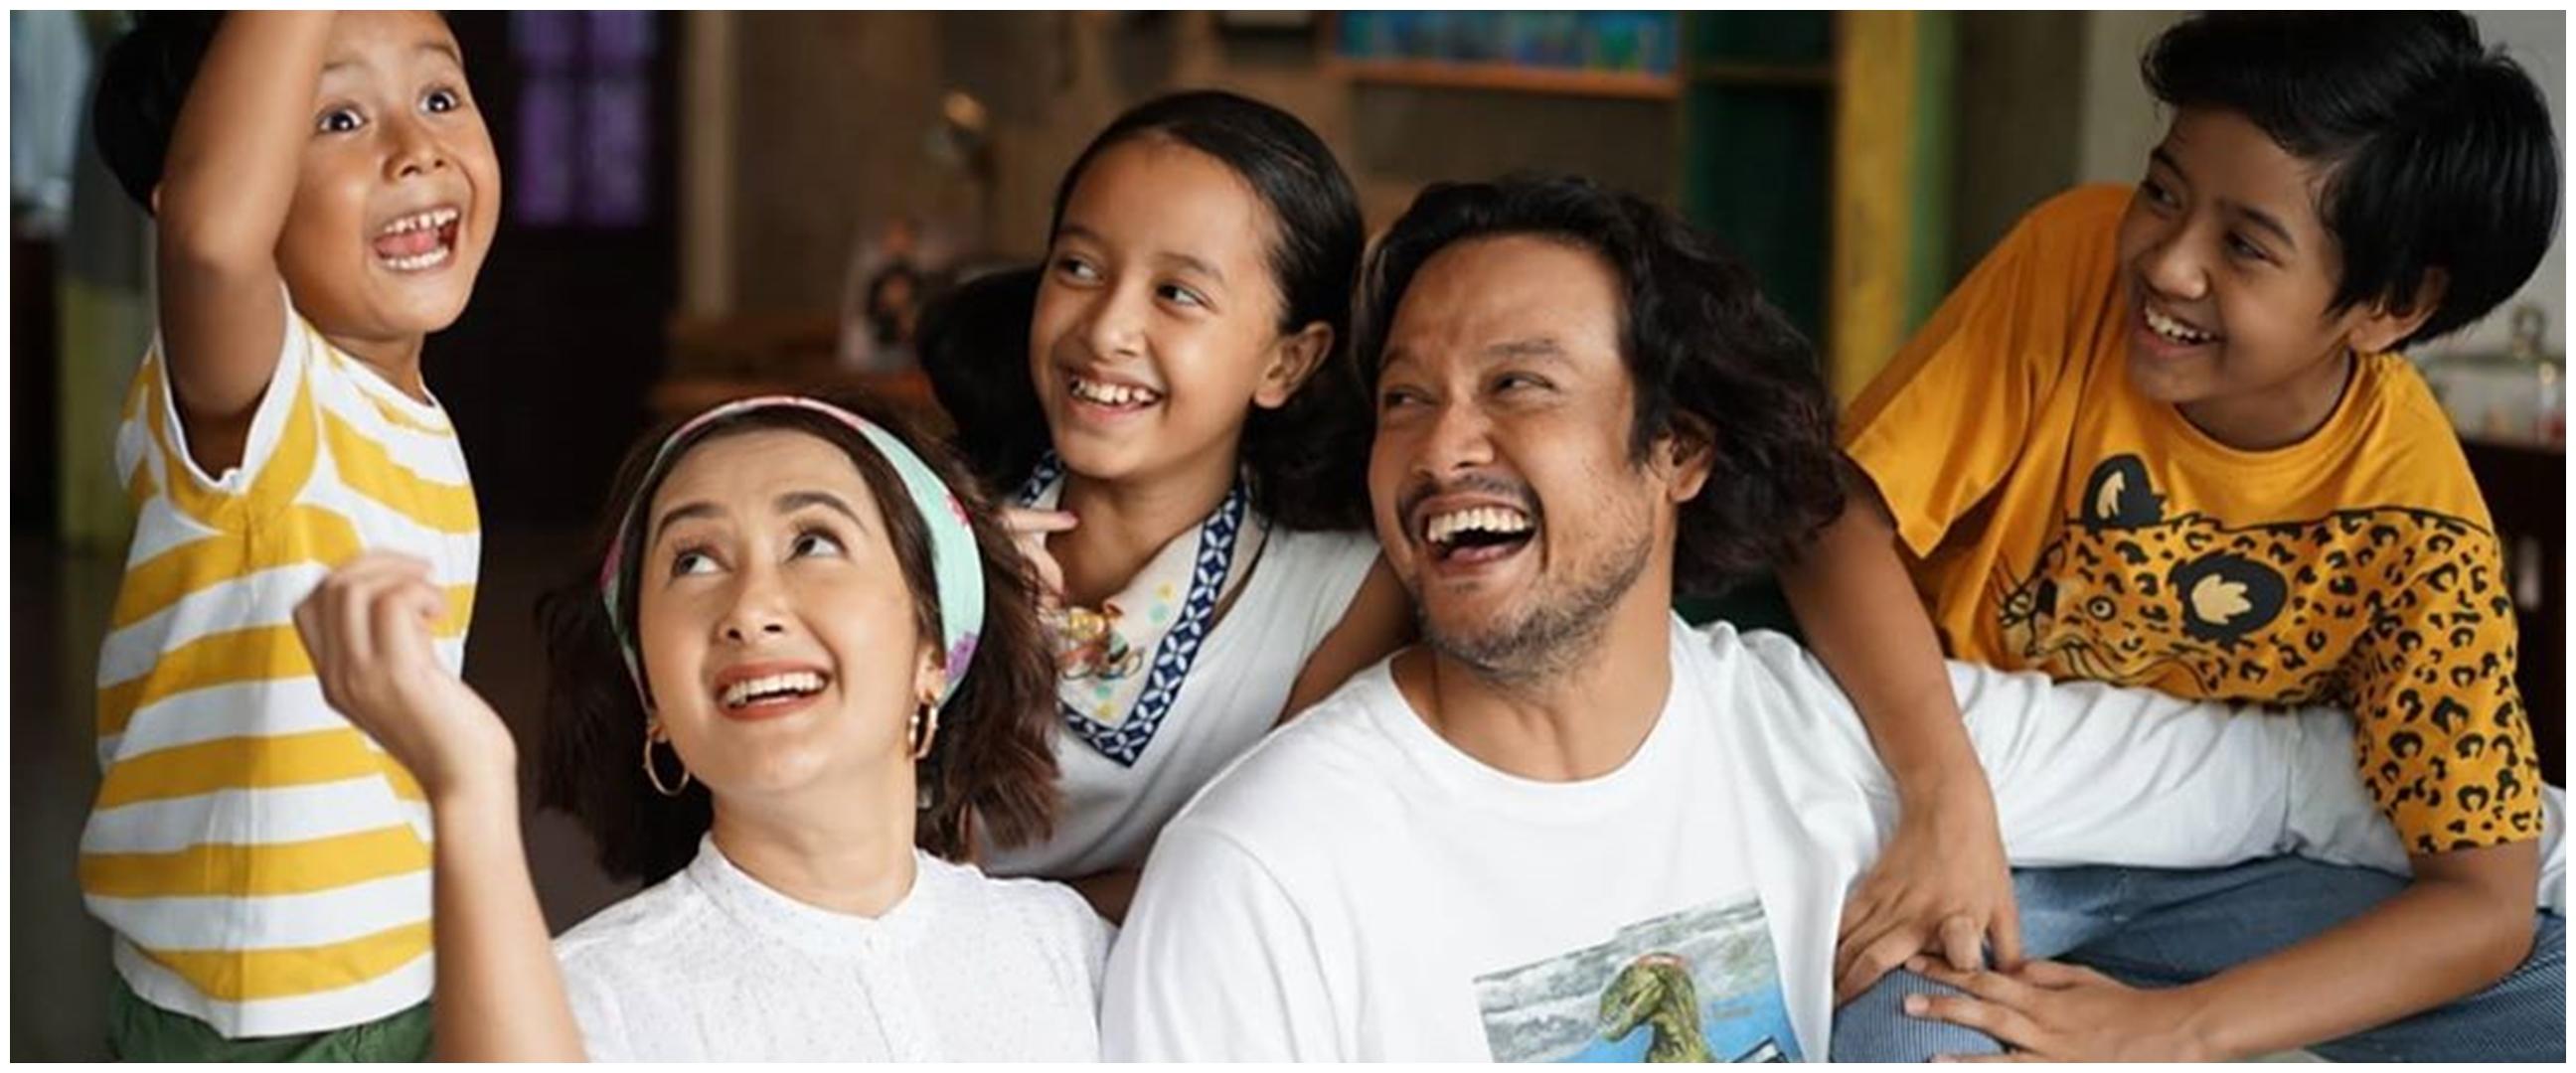 Widi Mulia unggah potret Dwi Sasono serta ungkap isi hati anak-anaknya